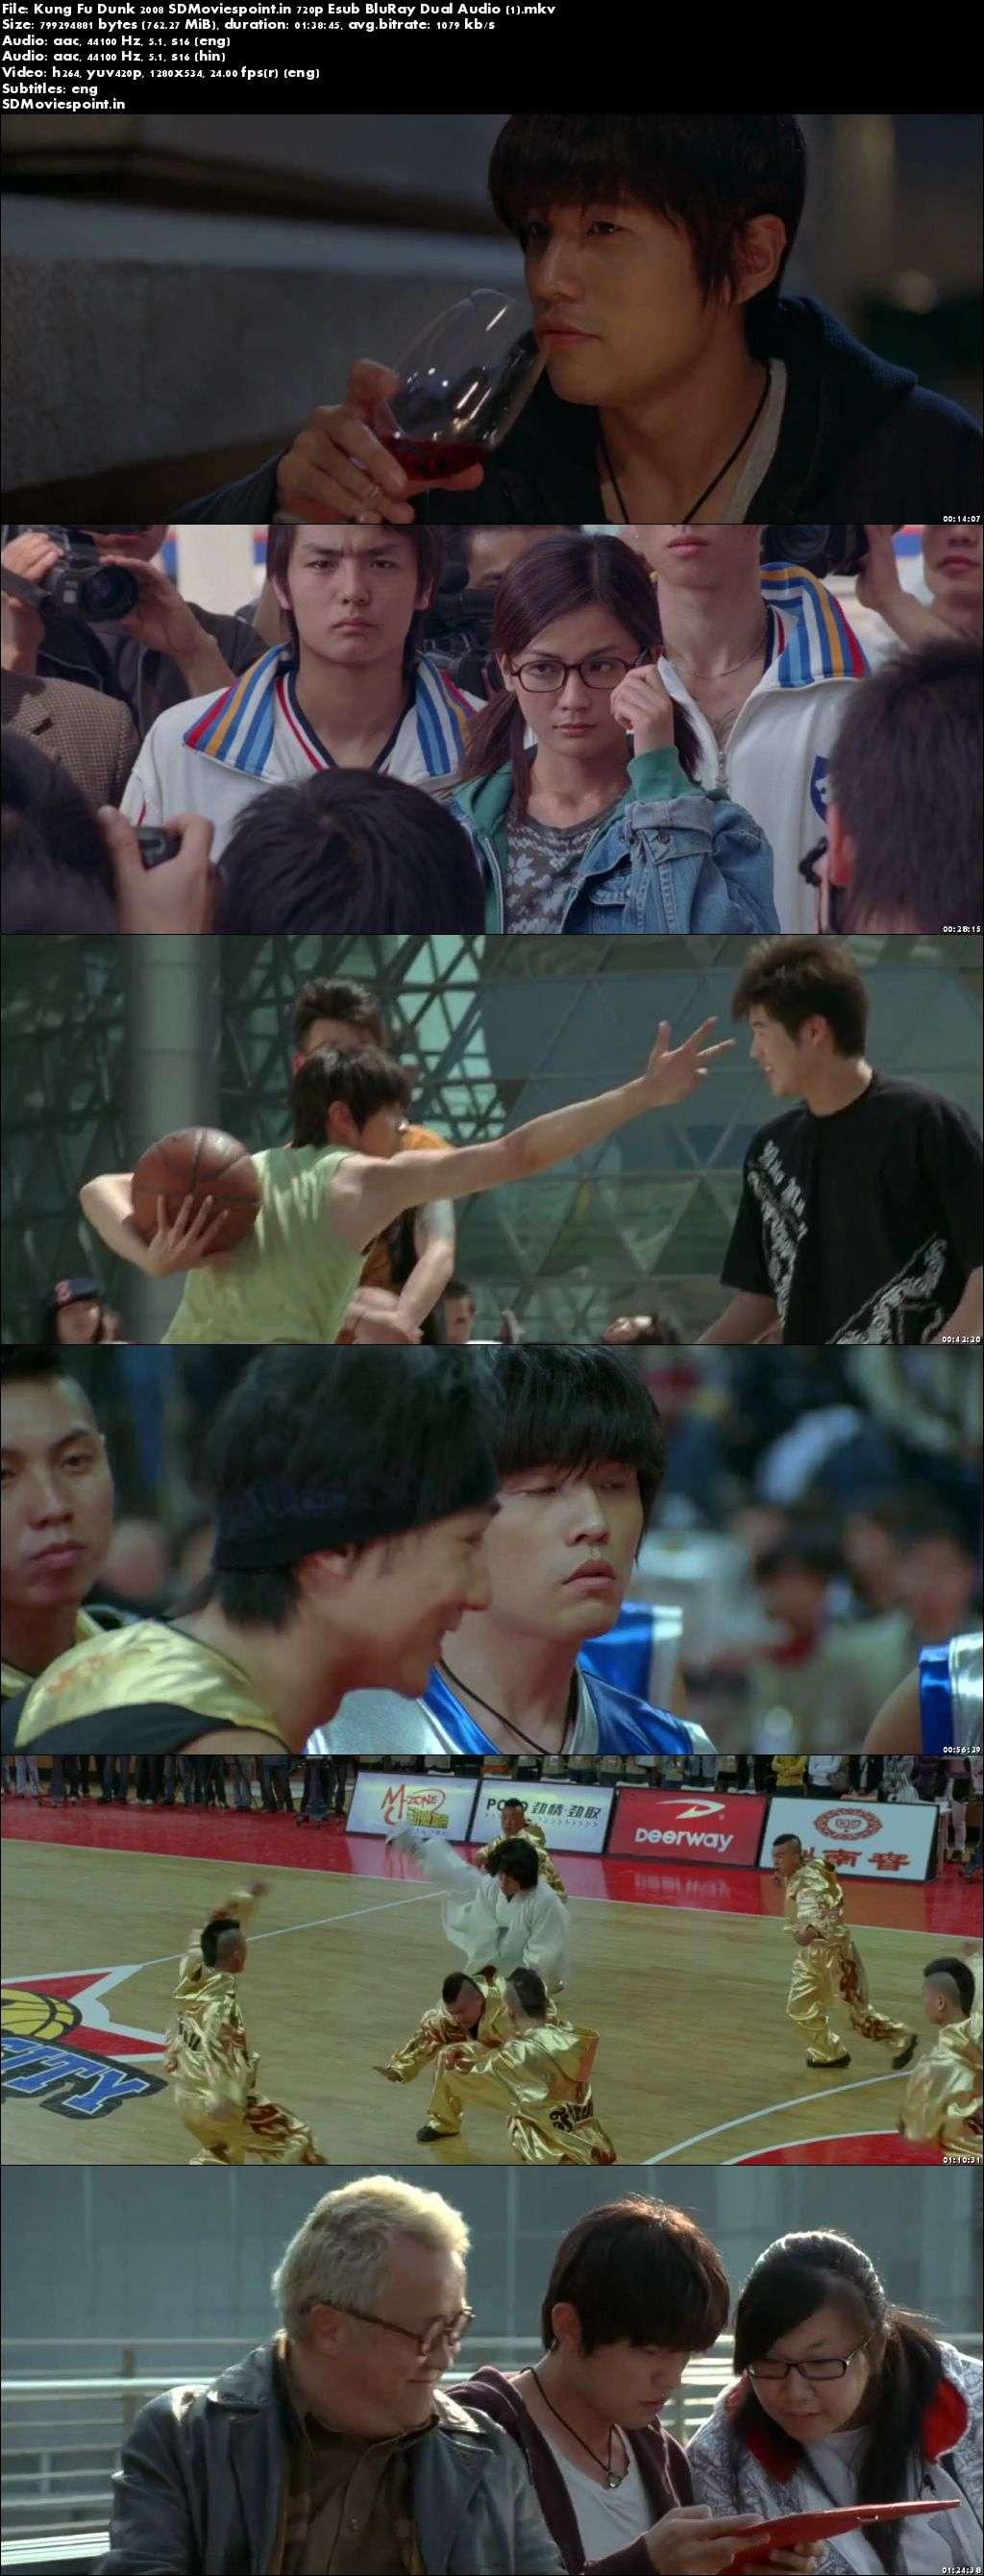 Screen Shots Kung Fu Dunk 2008 Full HD Movie Download Dual Audio 720p Free Kung Fu Dunk 2008 Full HD Movie Download Dual Audio 720p Free